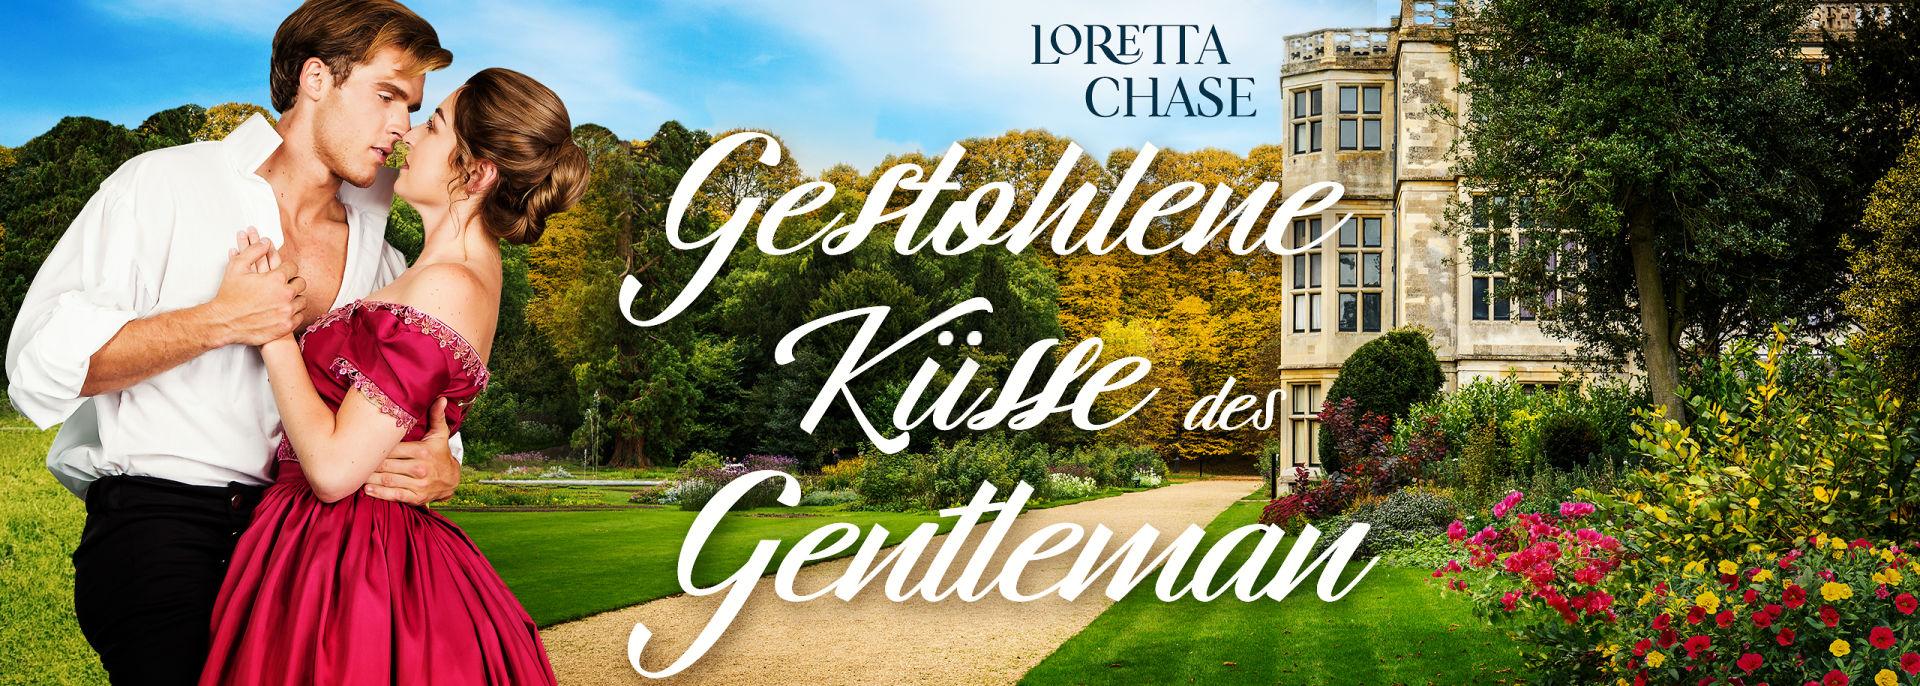 Gestohlene Küsse des Gentleman